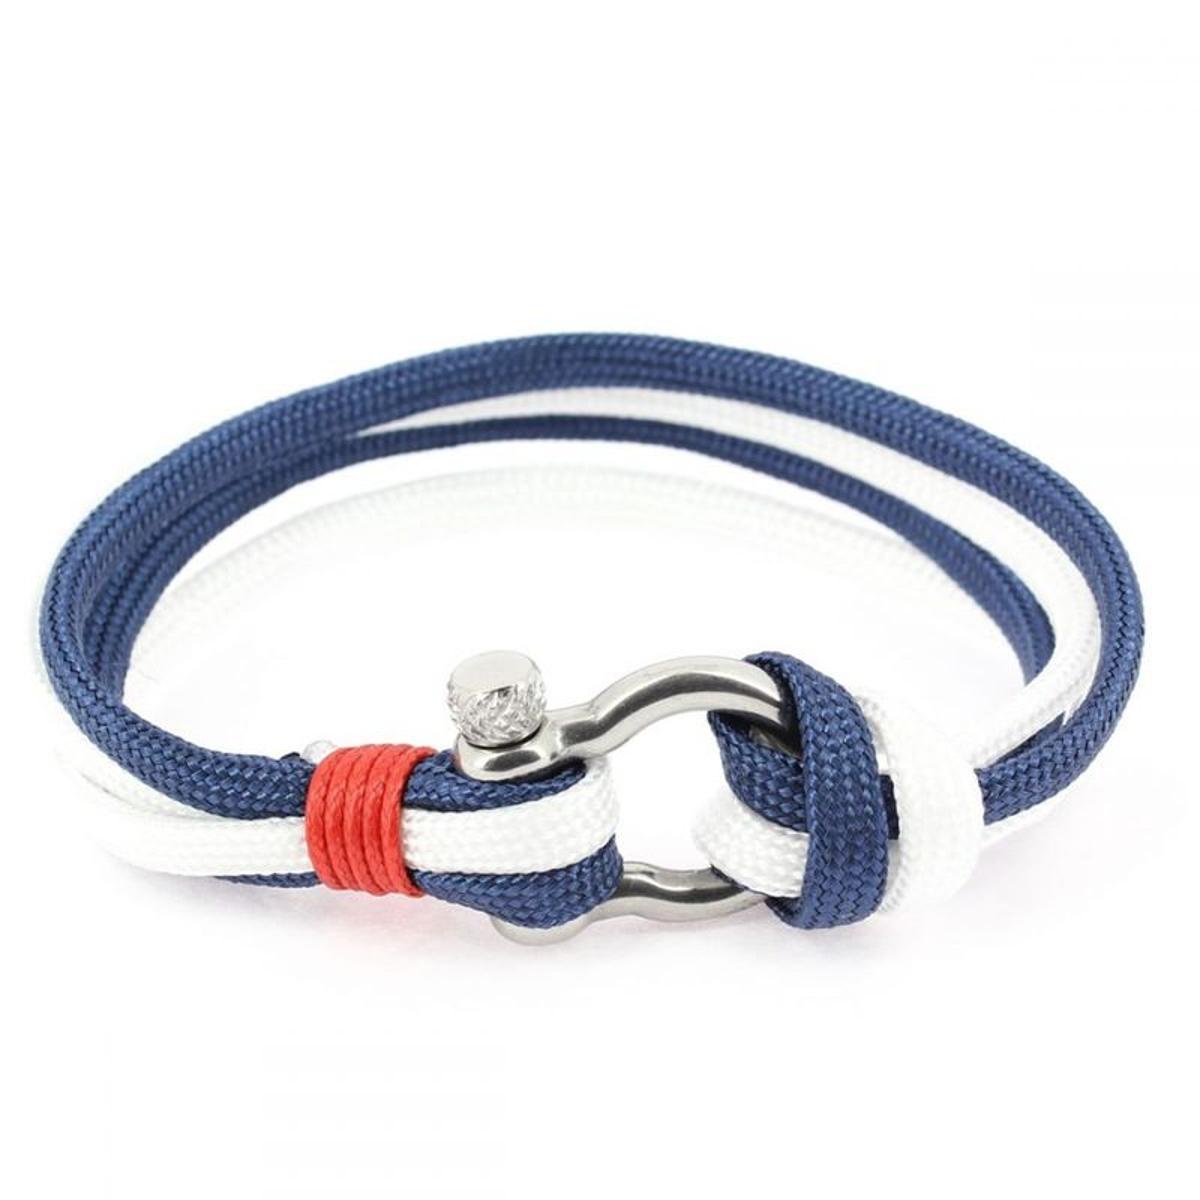 Bracelet fermoir manille lyre, navy et blanc